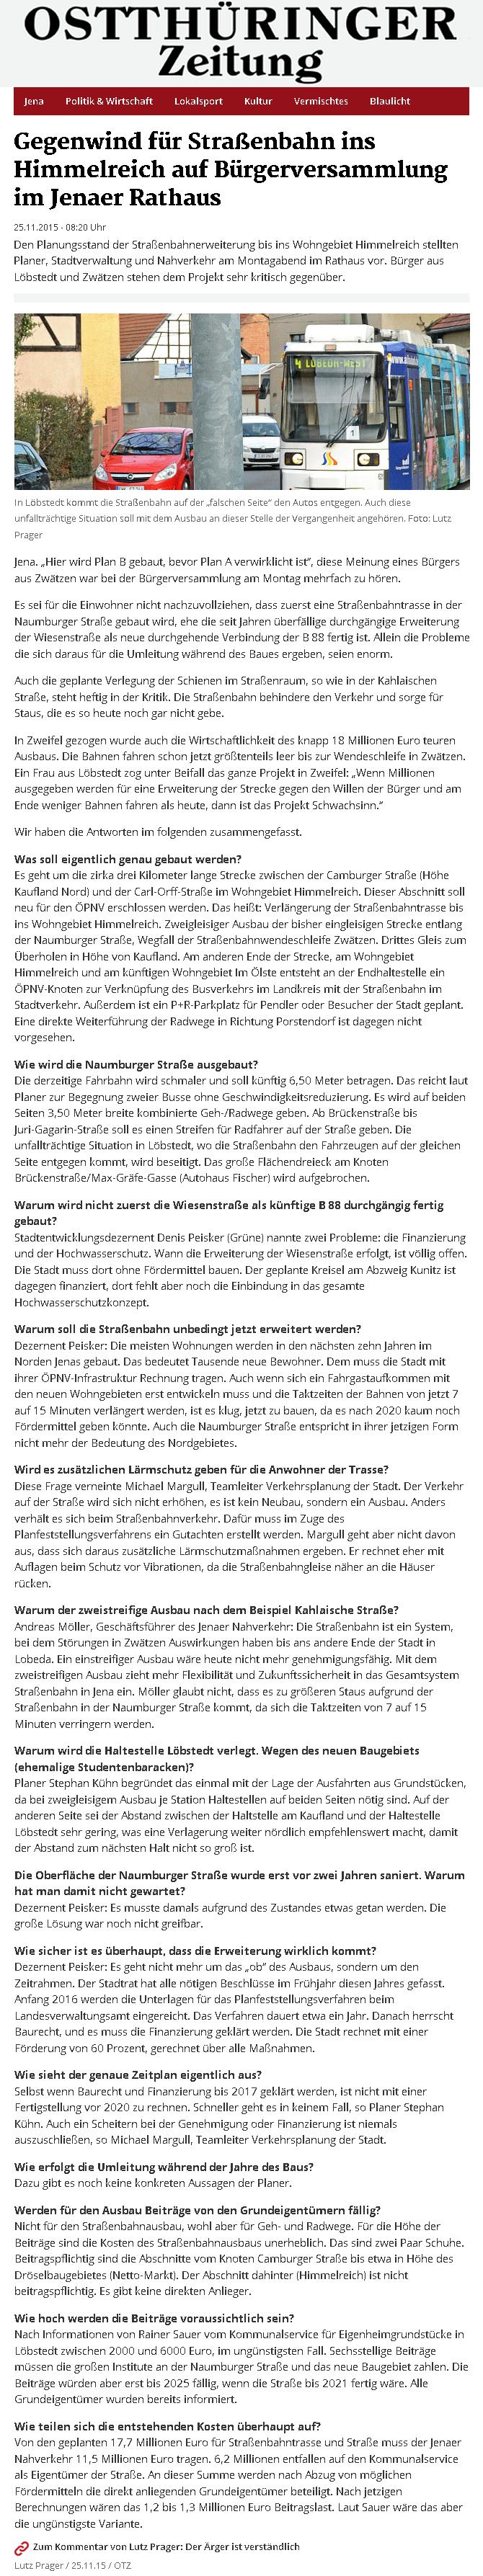 OTZ Jena Artikel 2015-11-25